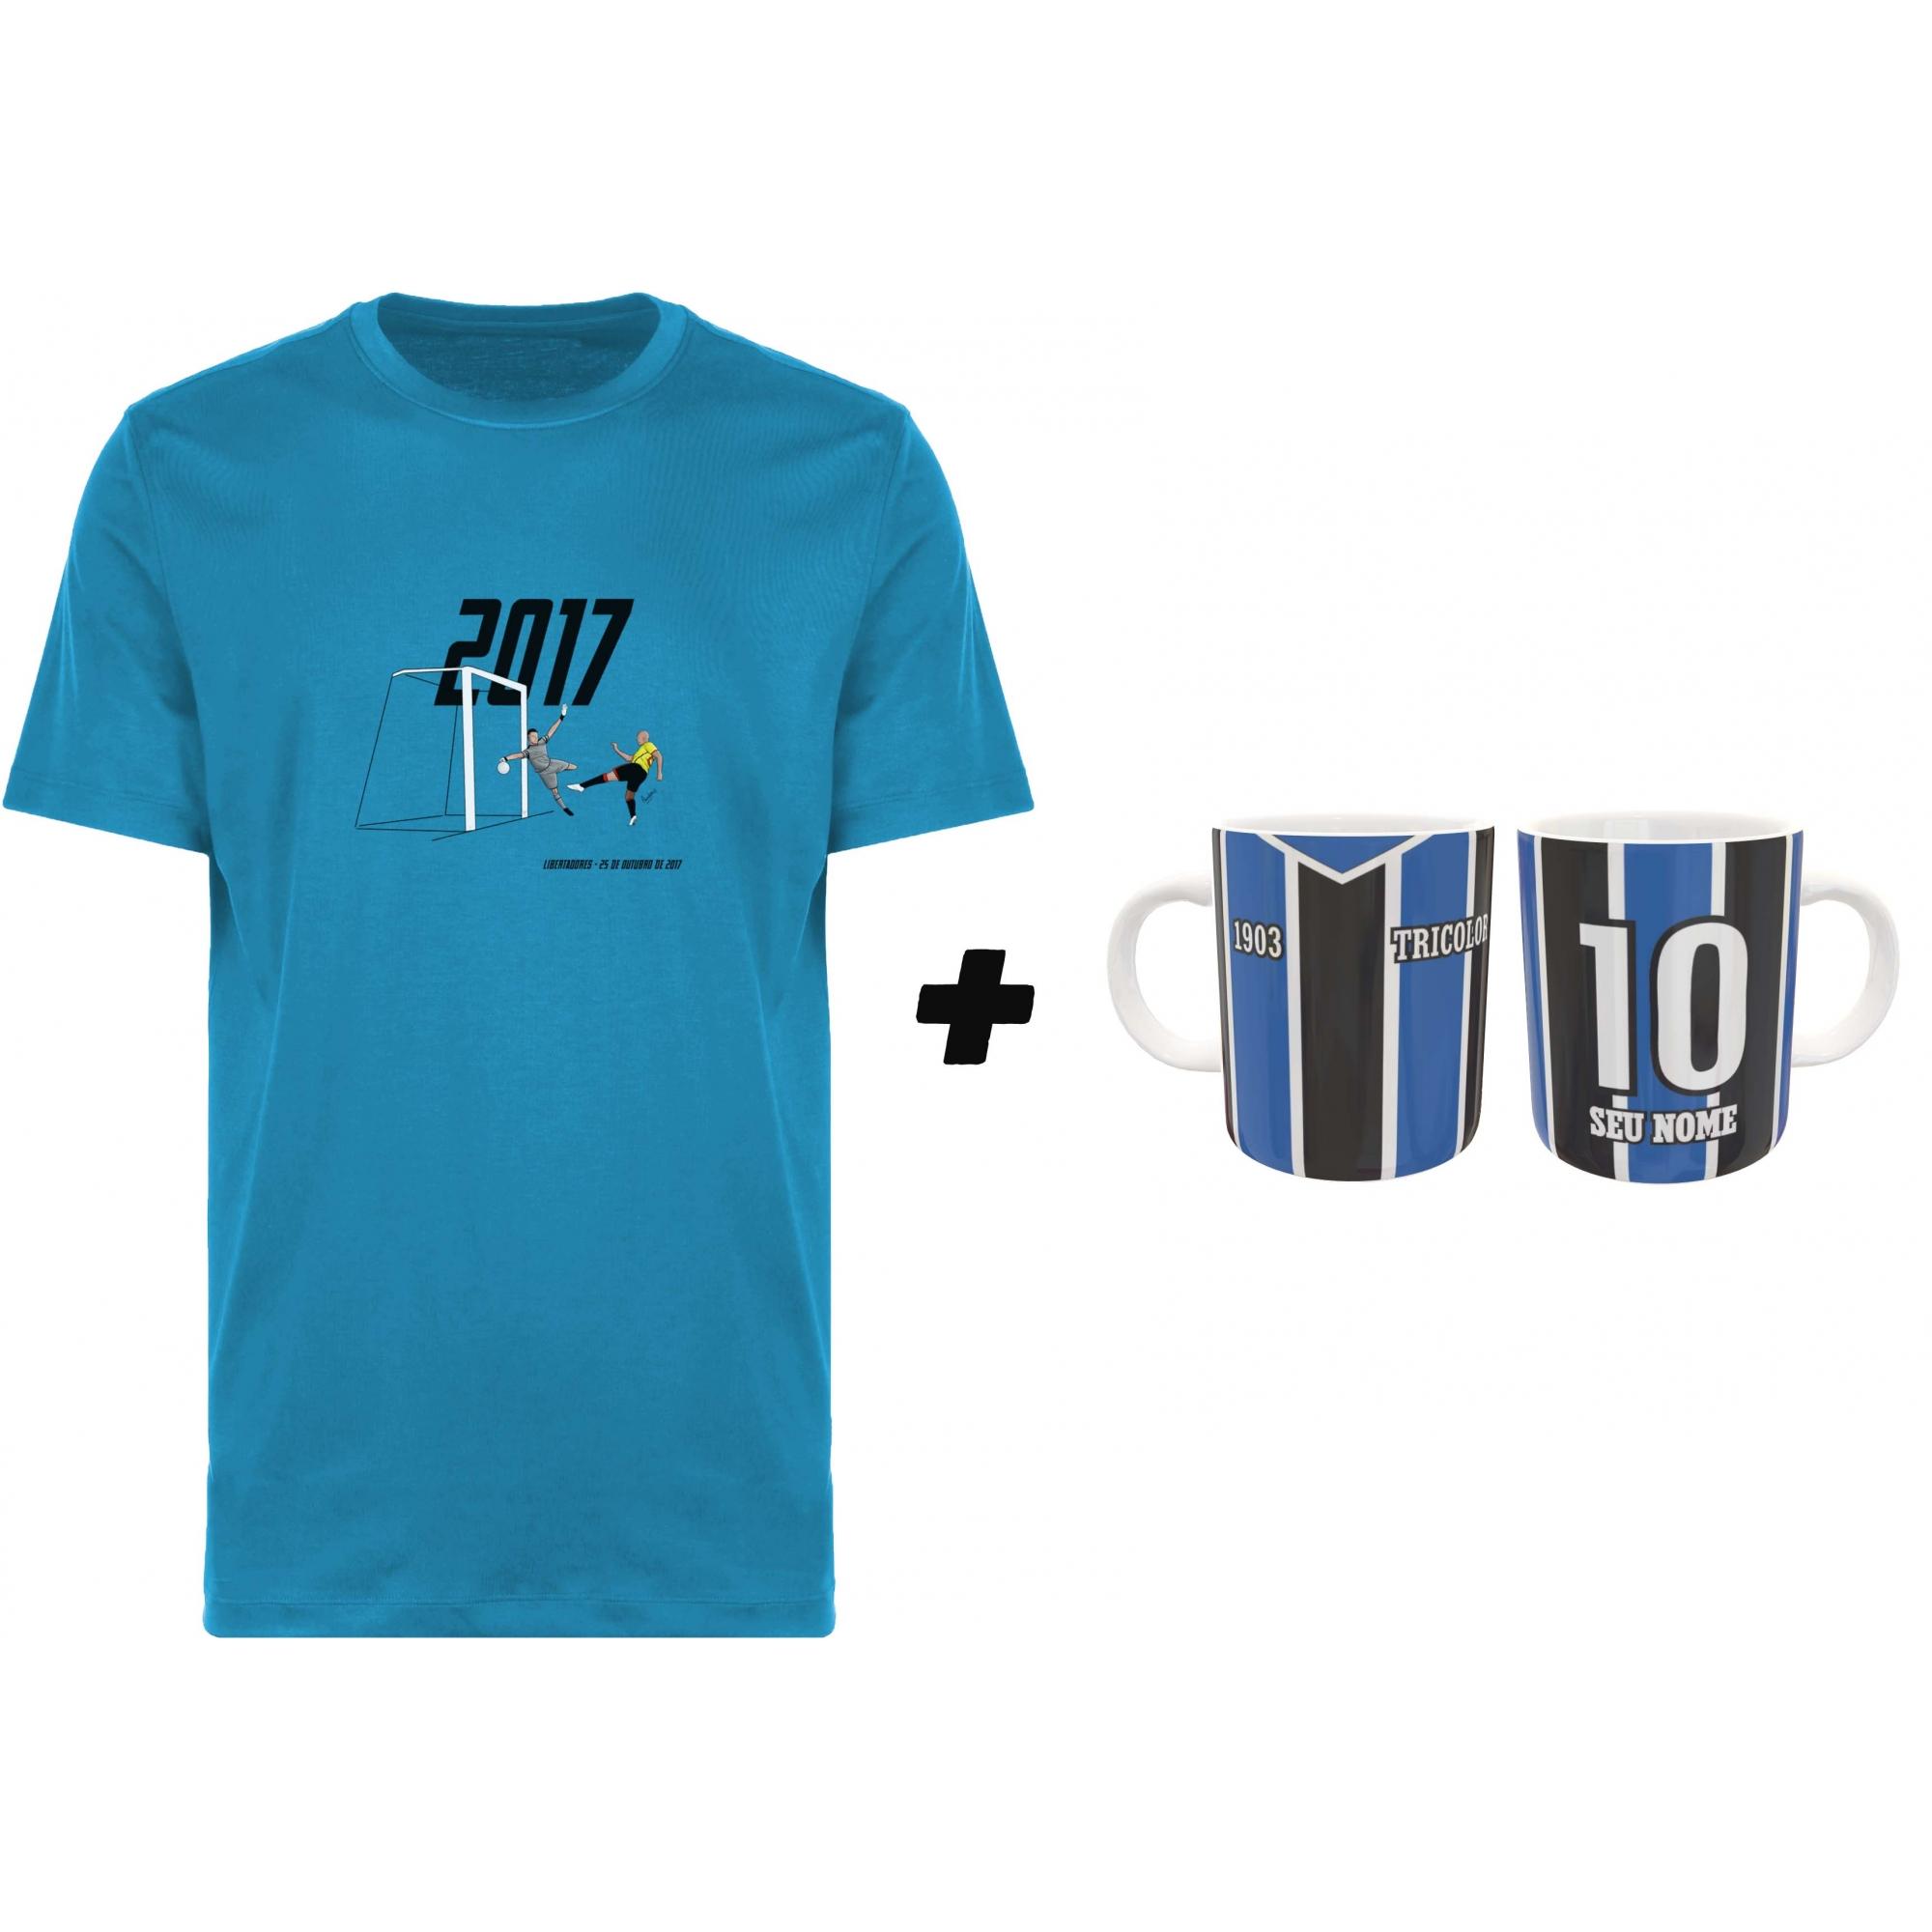 Kit Camiseta + Caneca Tricolor Imortal